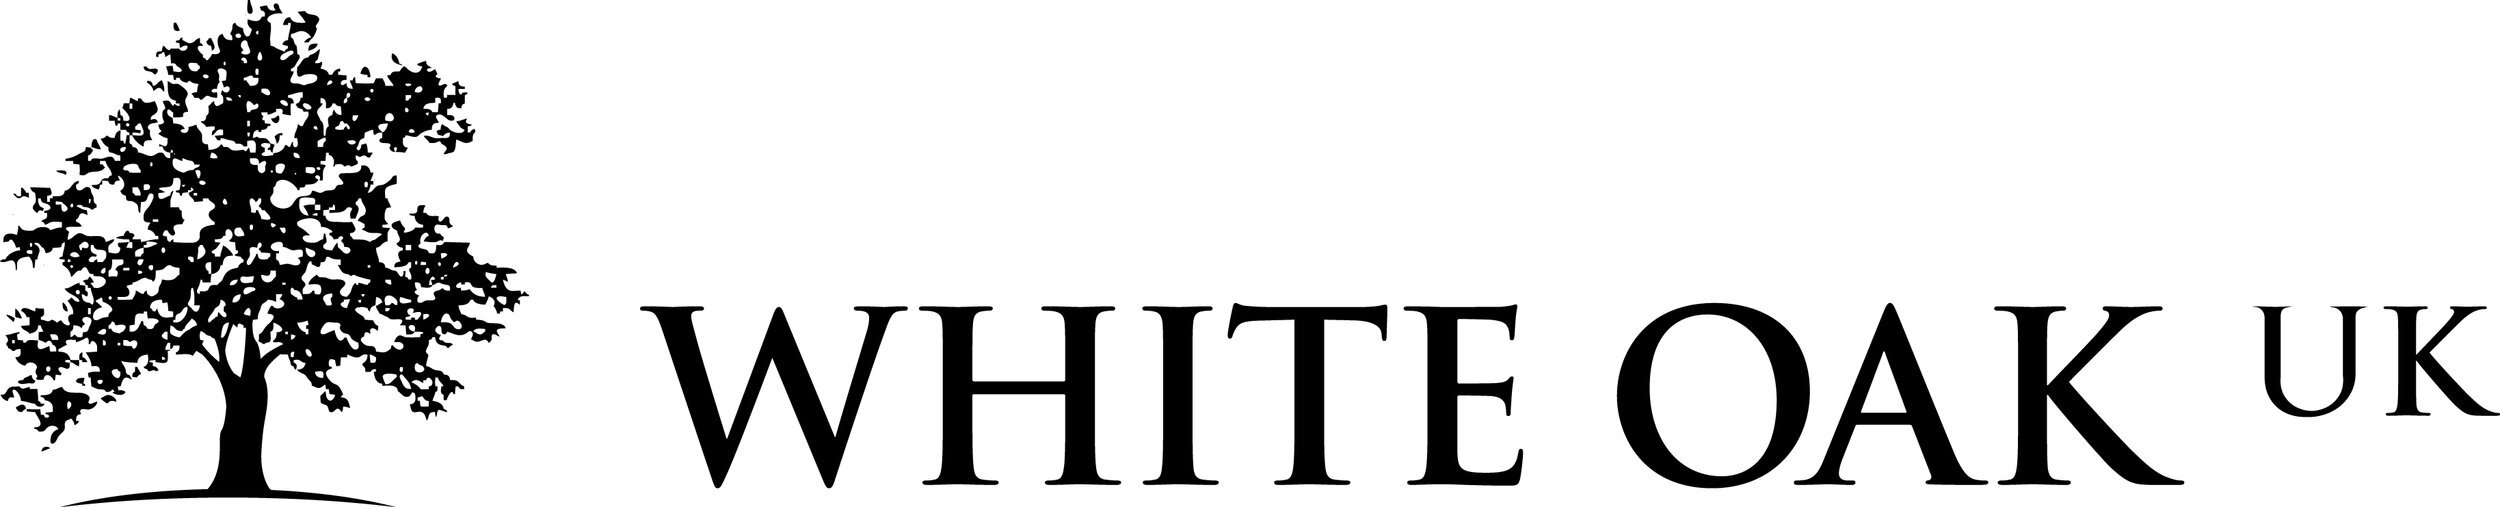 WhiteOak.jpg